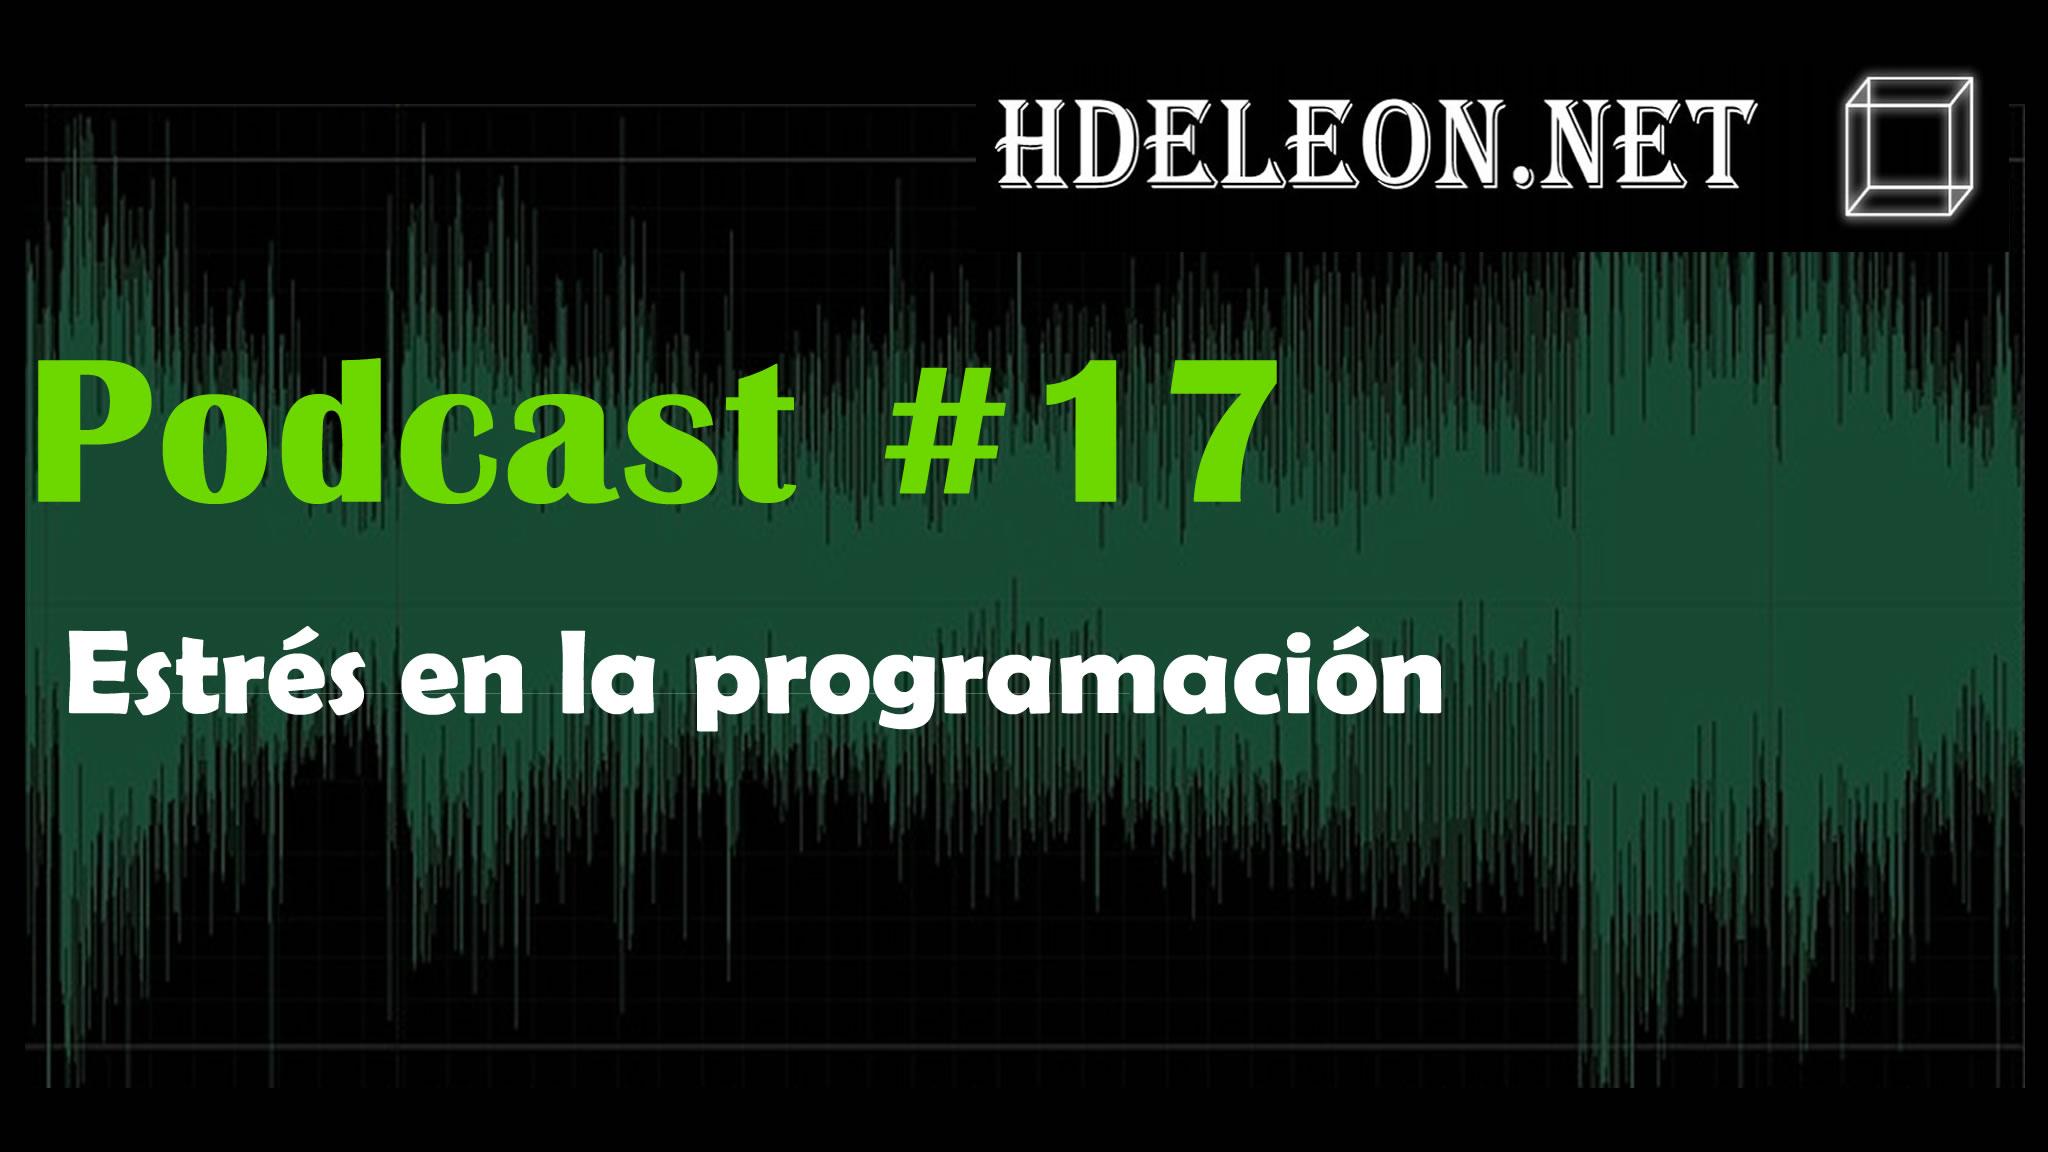 Podcast #17 – Estrés en la programación